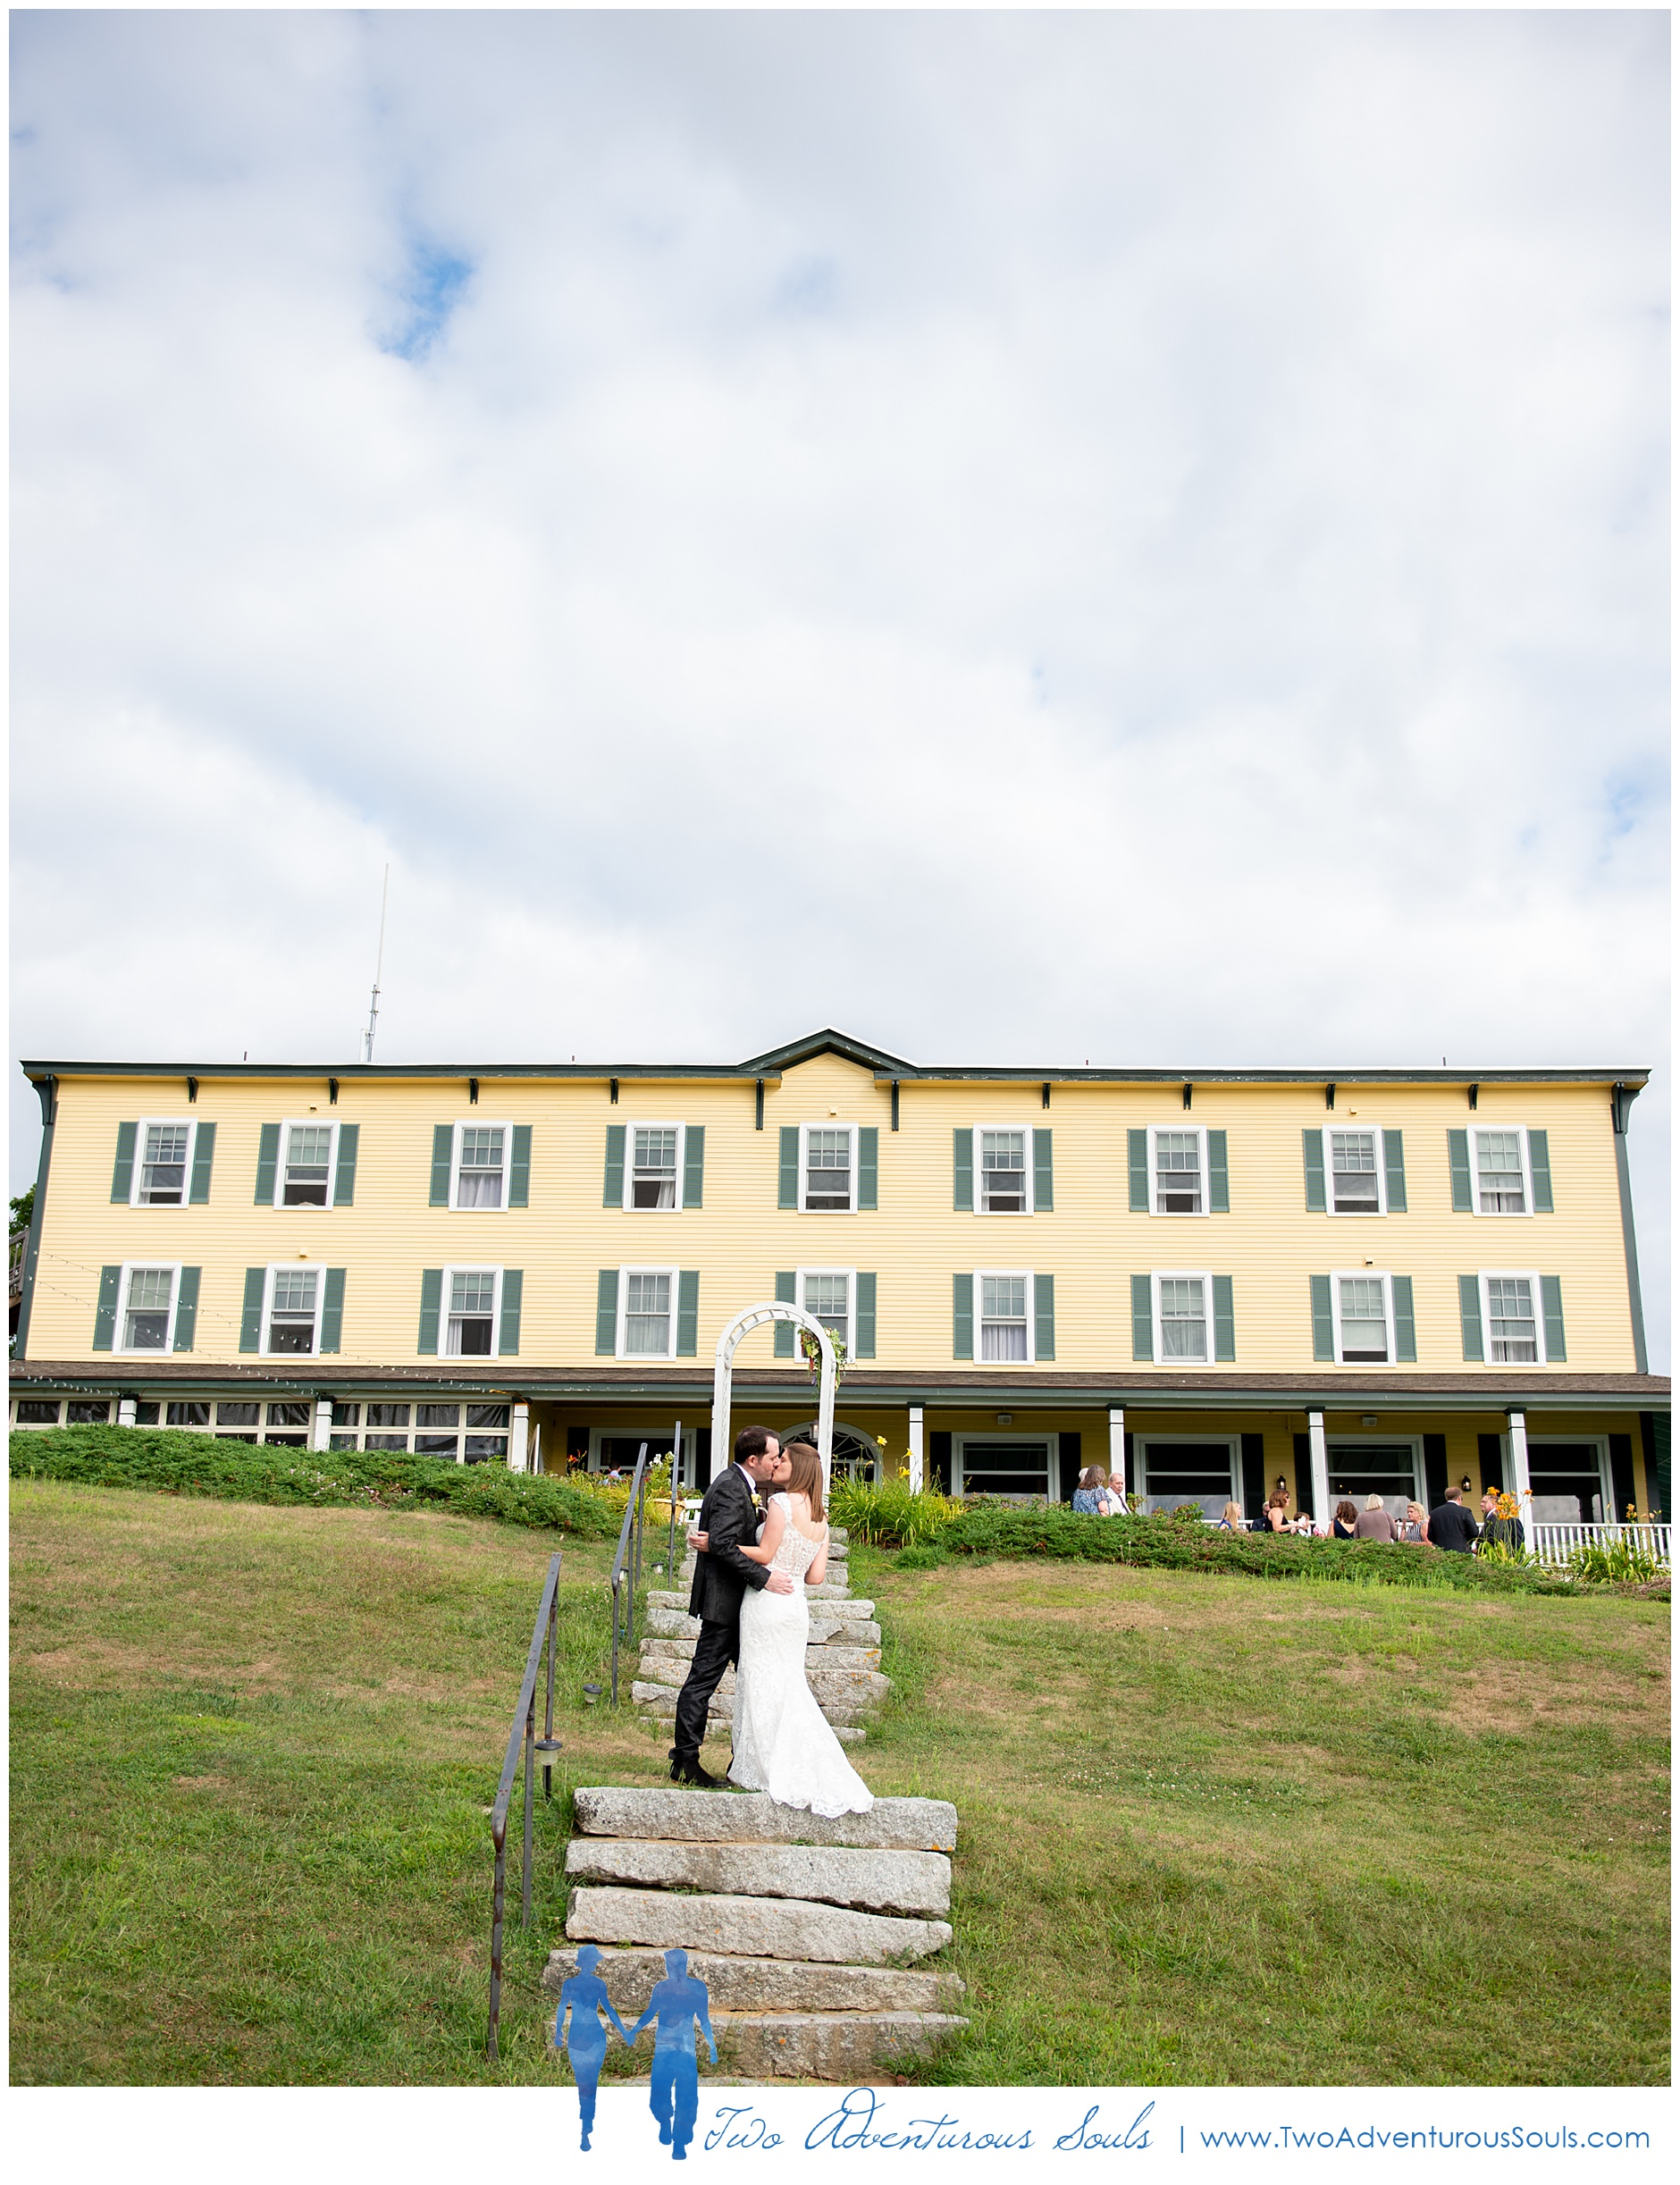 Chebeague Island Inn Wedding Photograpehrs, Maine Wedding Photographers, Two Adventurous Souls-082419_0007.jpg